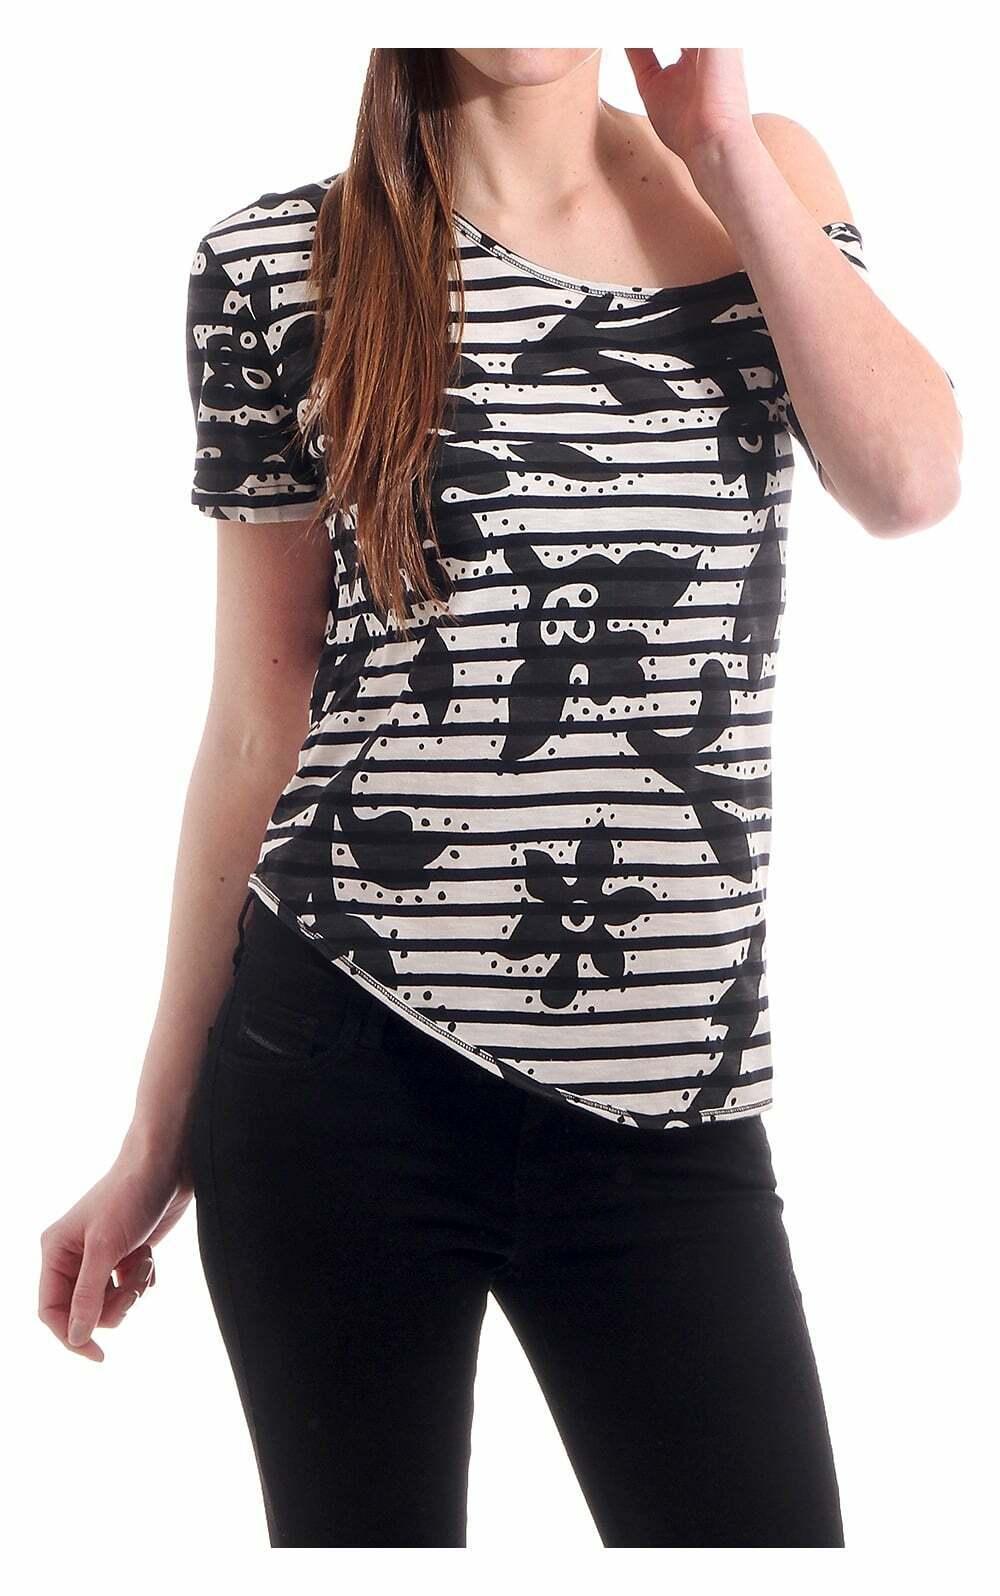 Vivienne Westwood Woherren Anglomania One Shoulder Bold Patterned T Shirt